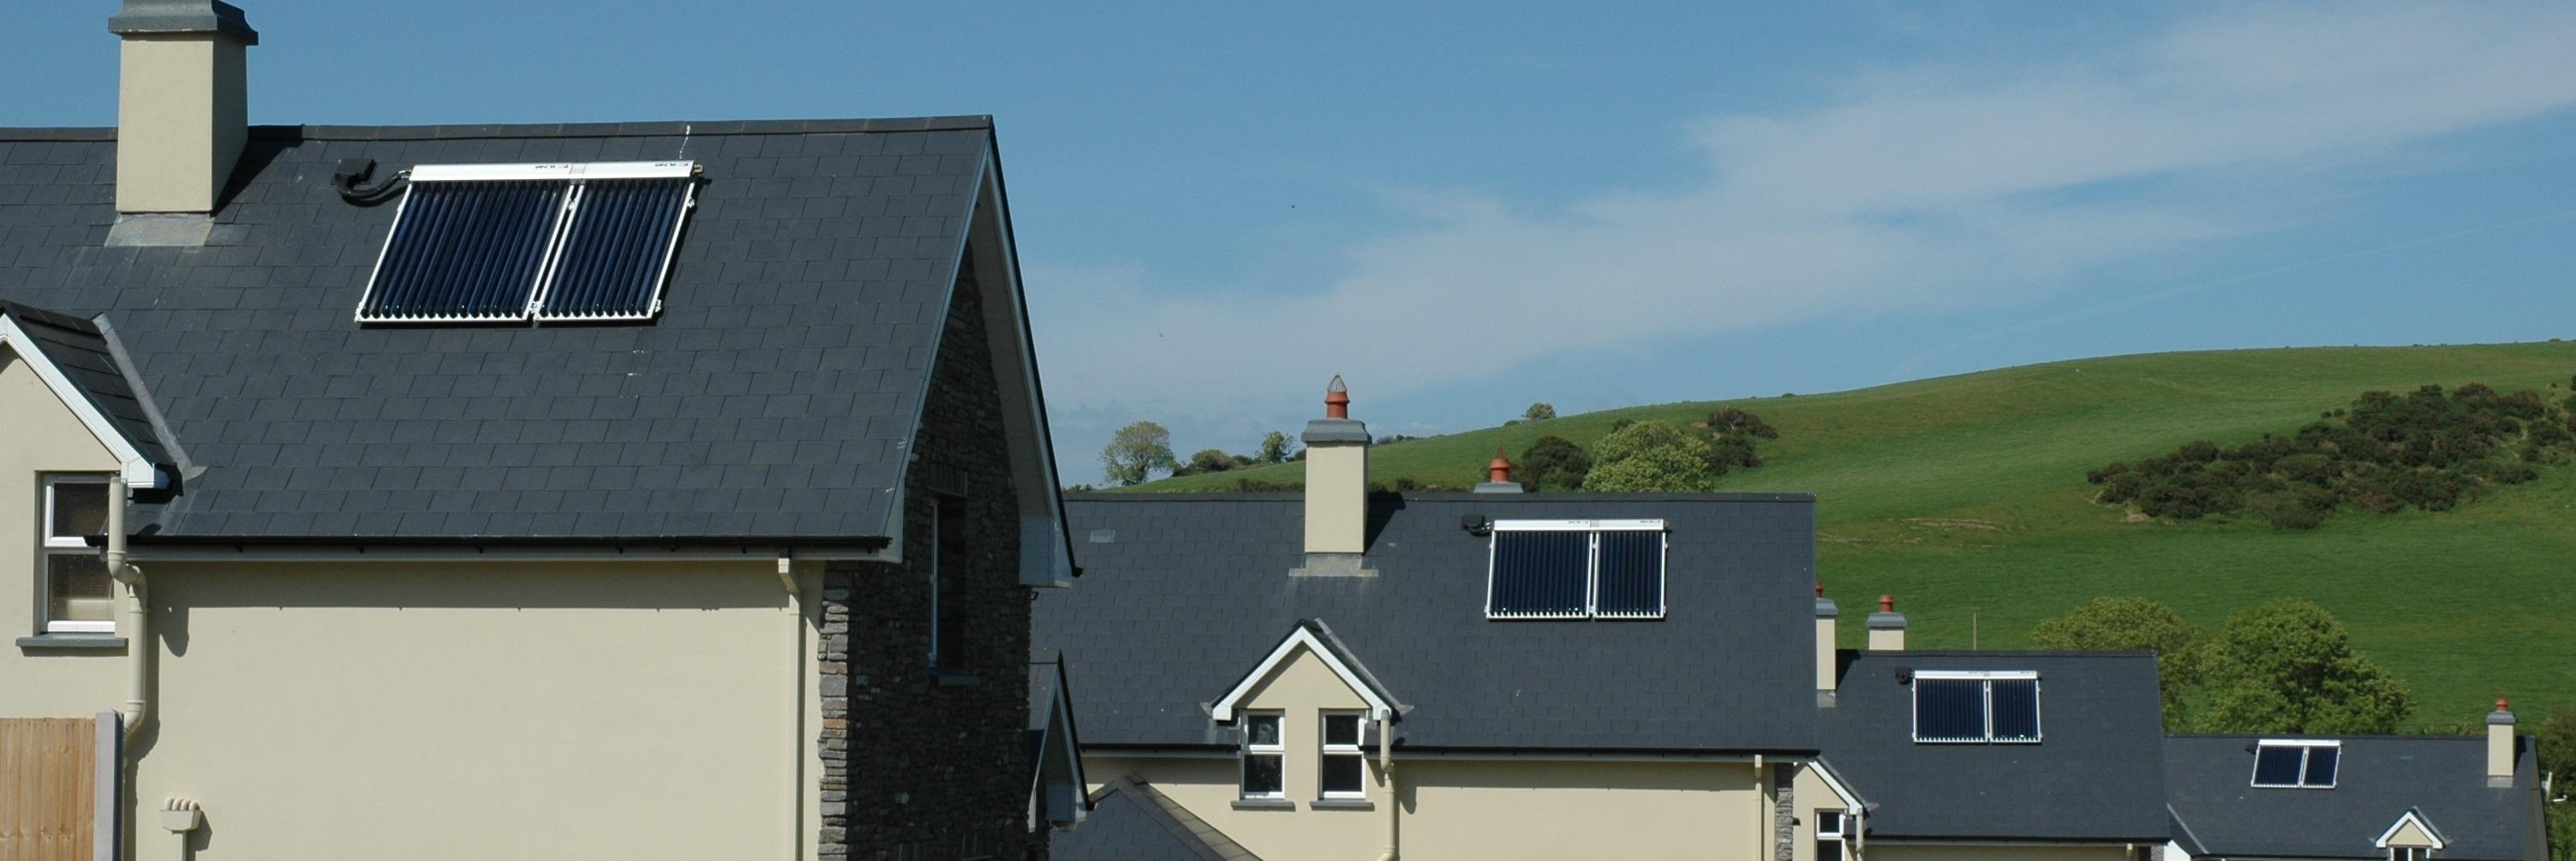 solar-thermal-scheme-in-Ballinspittle1